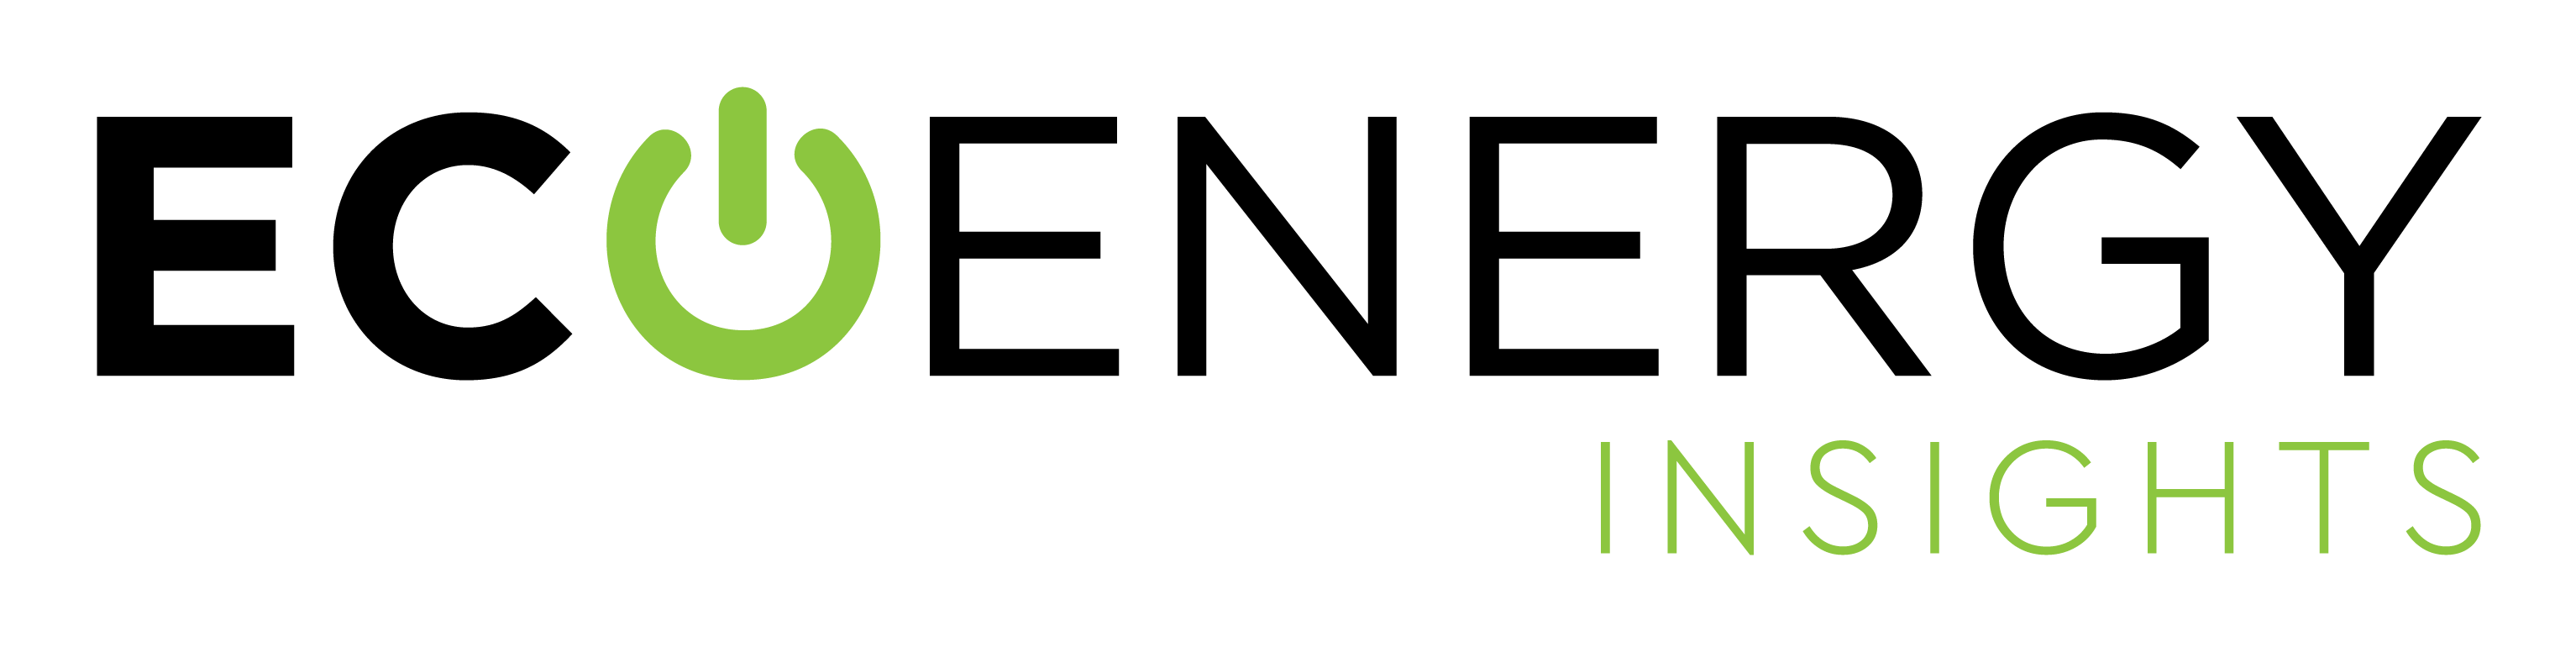 EcoEnergy Insights logo